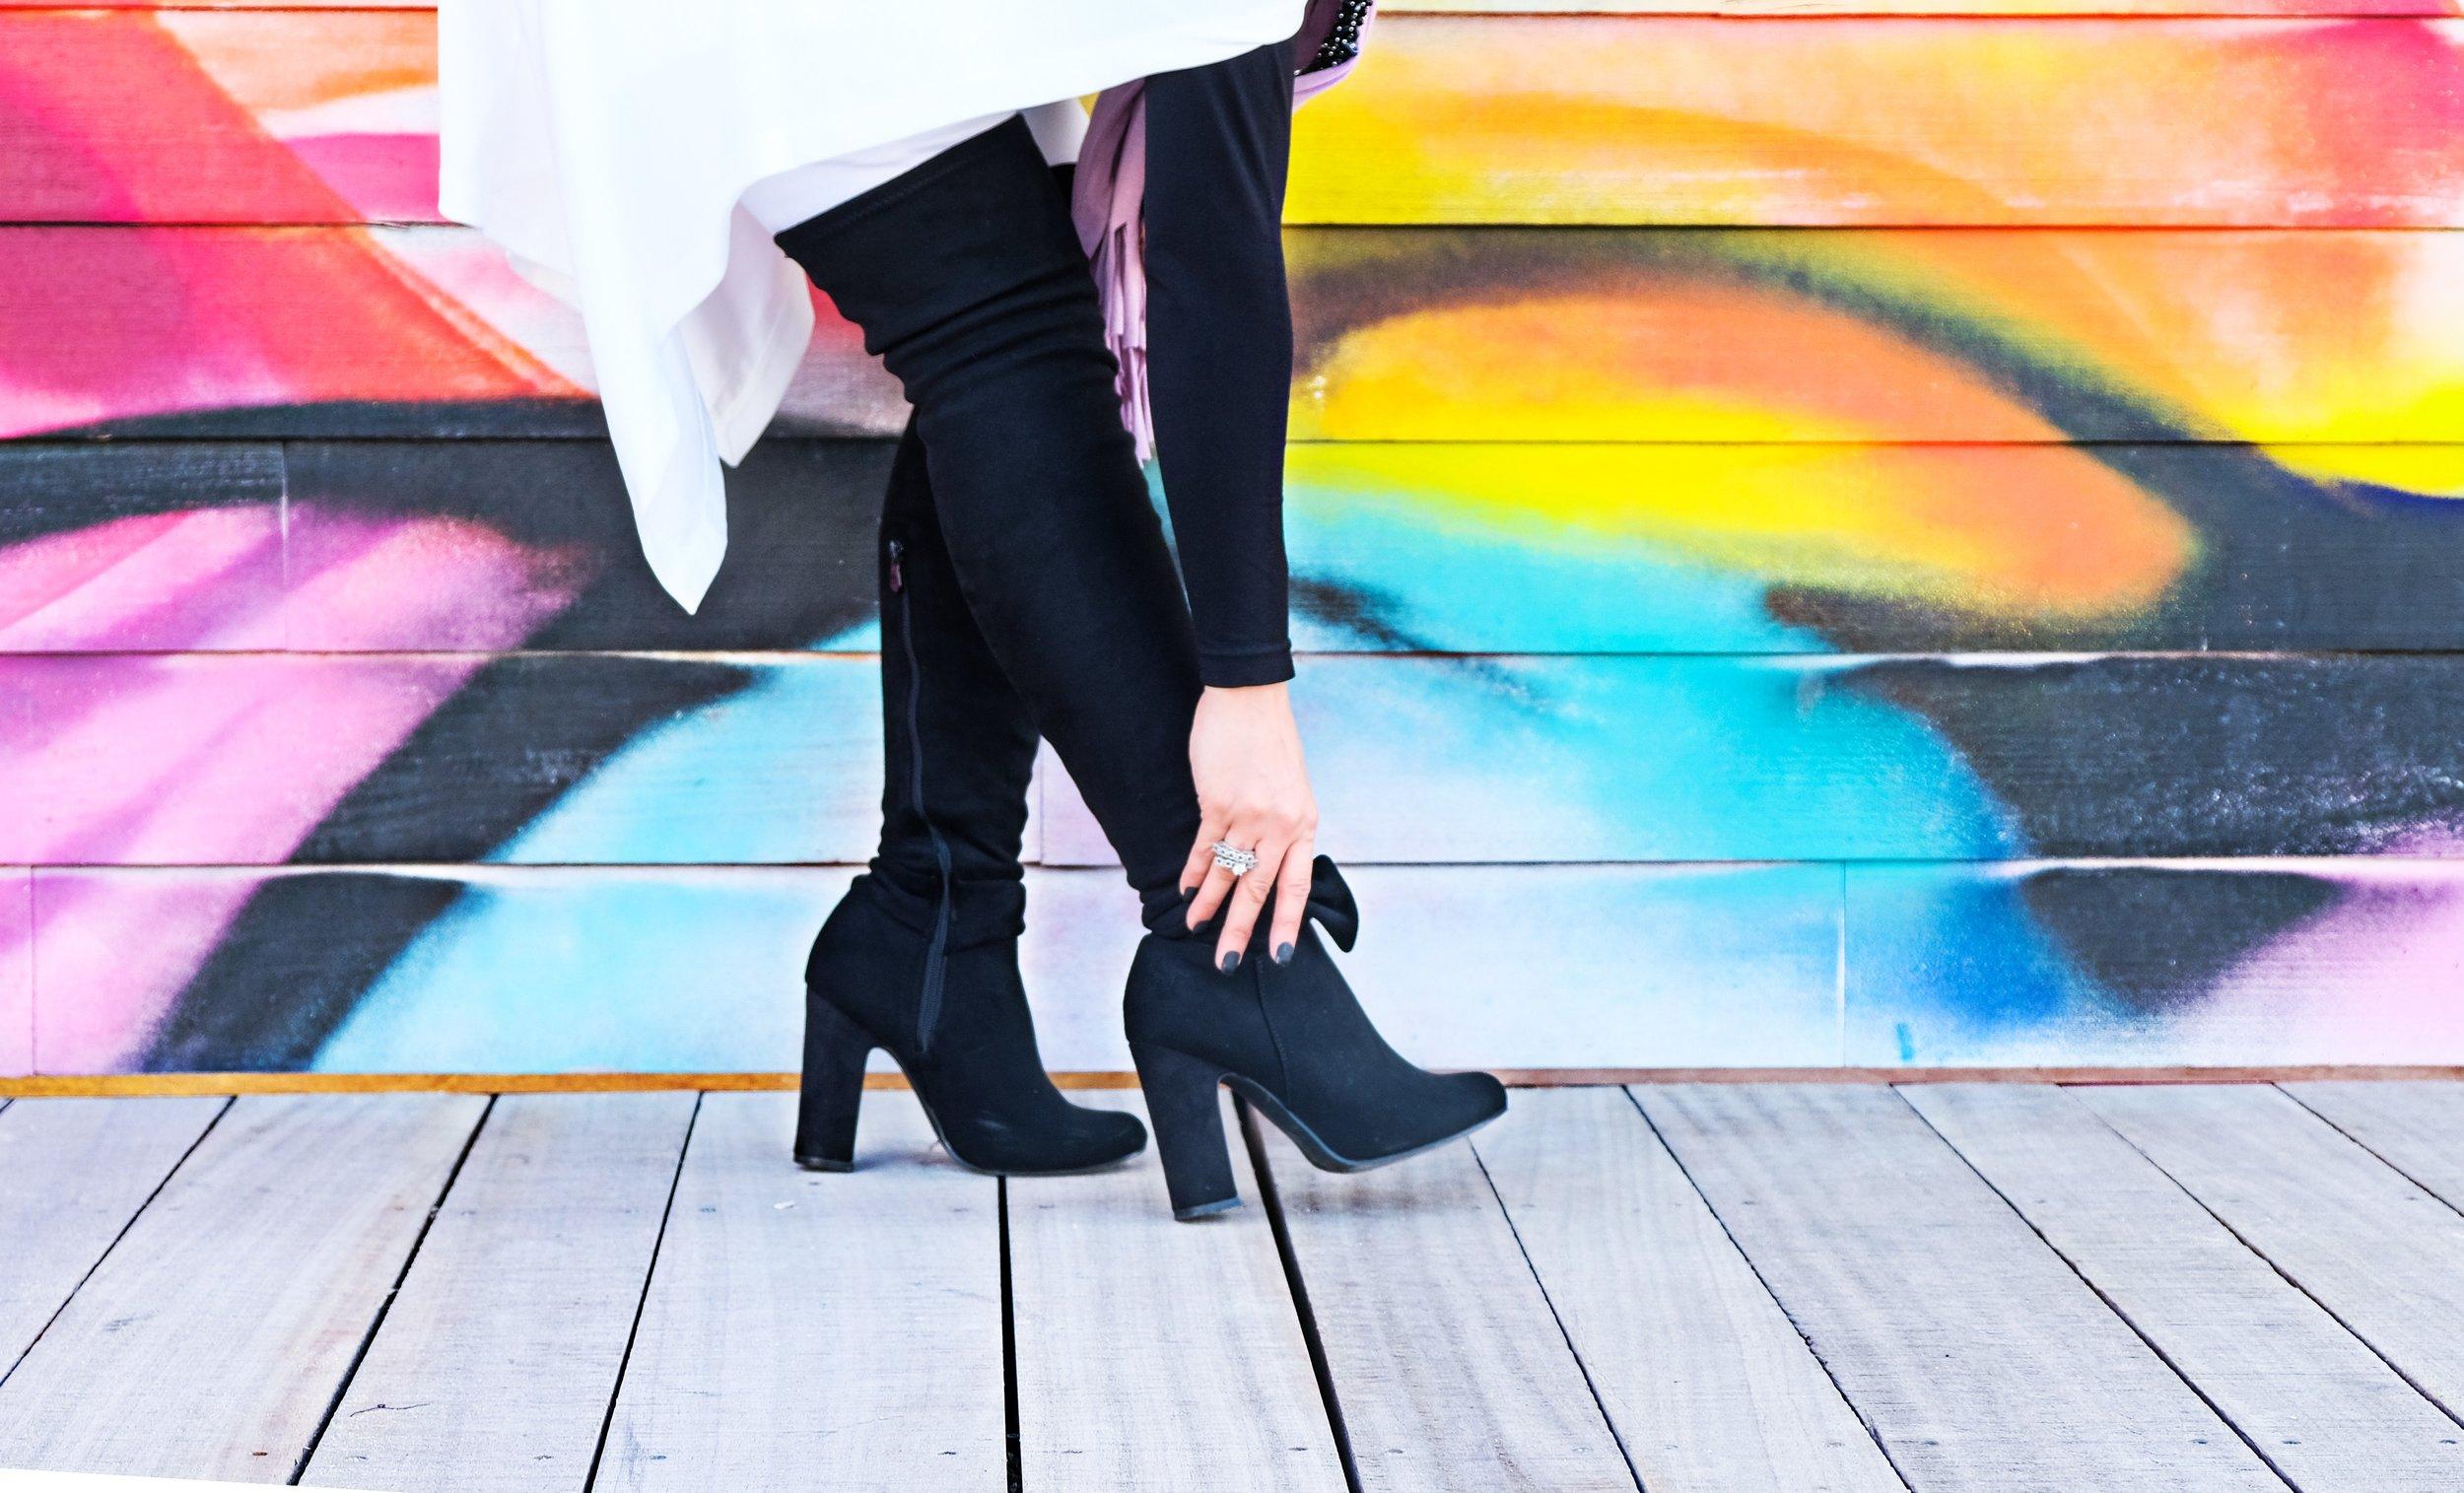 boots-fashion-fashionable-1123985.jpg